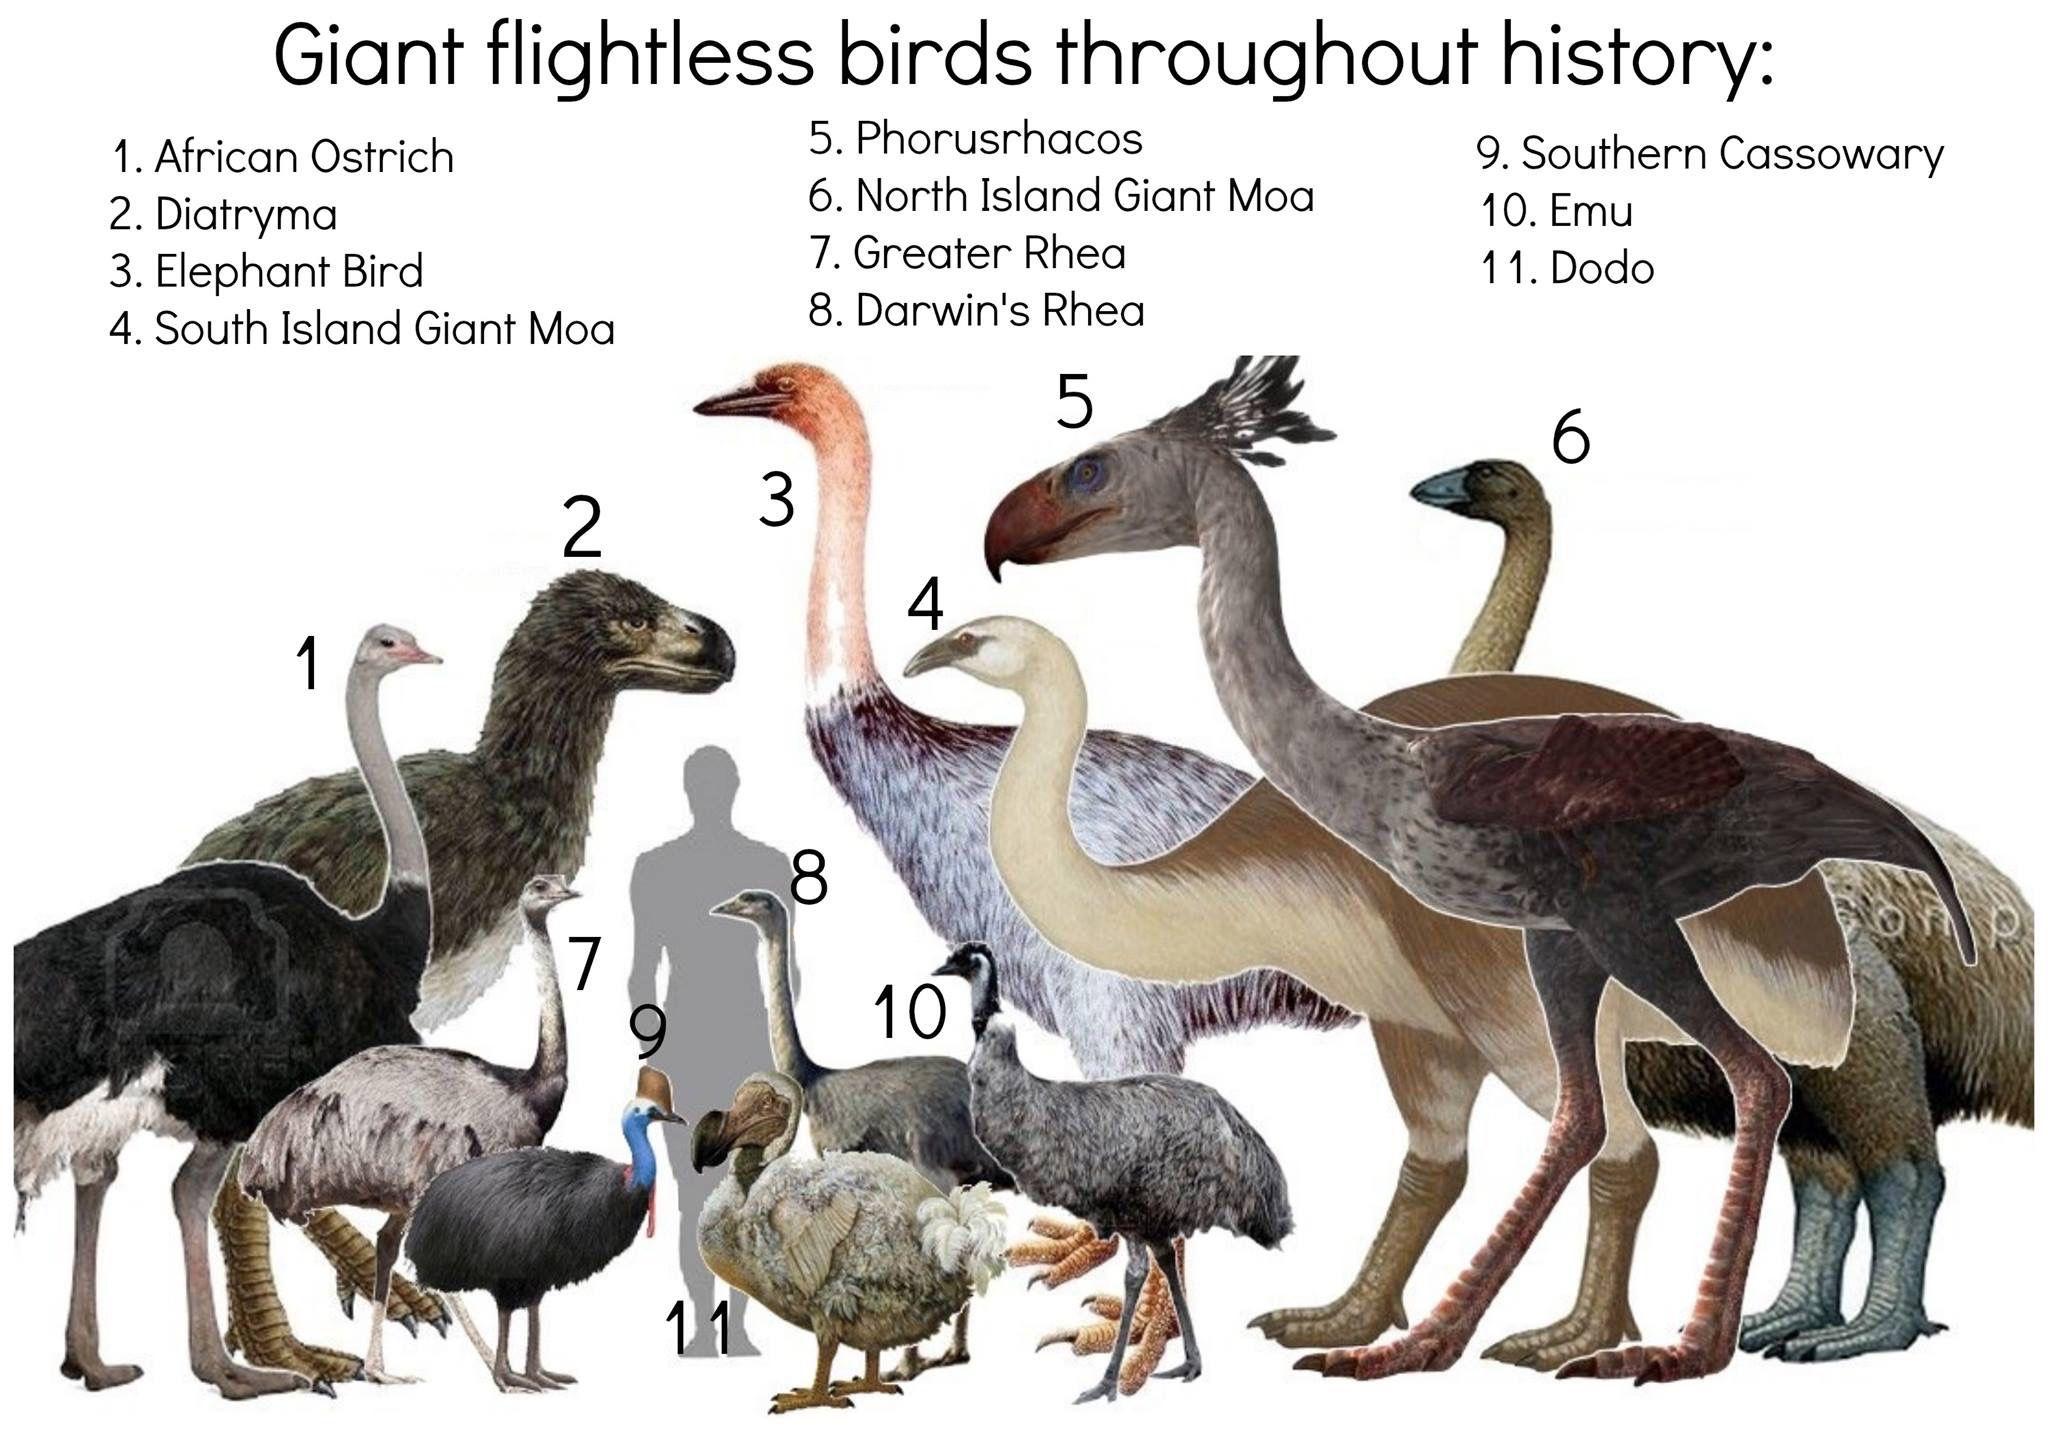 giantbirds_1_full.jpg 2,048×1,433 pixels Hewan